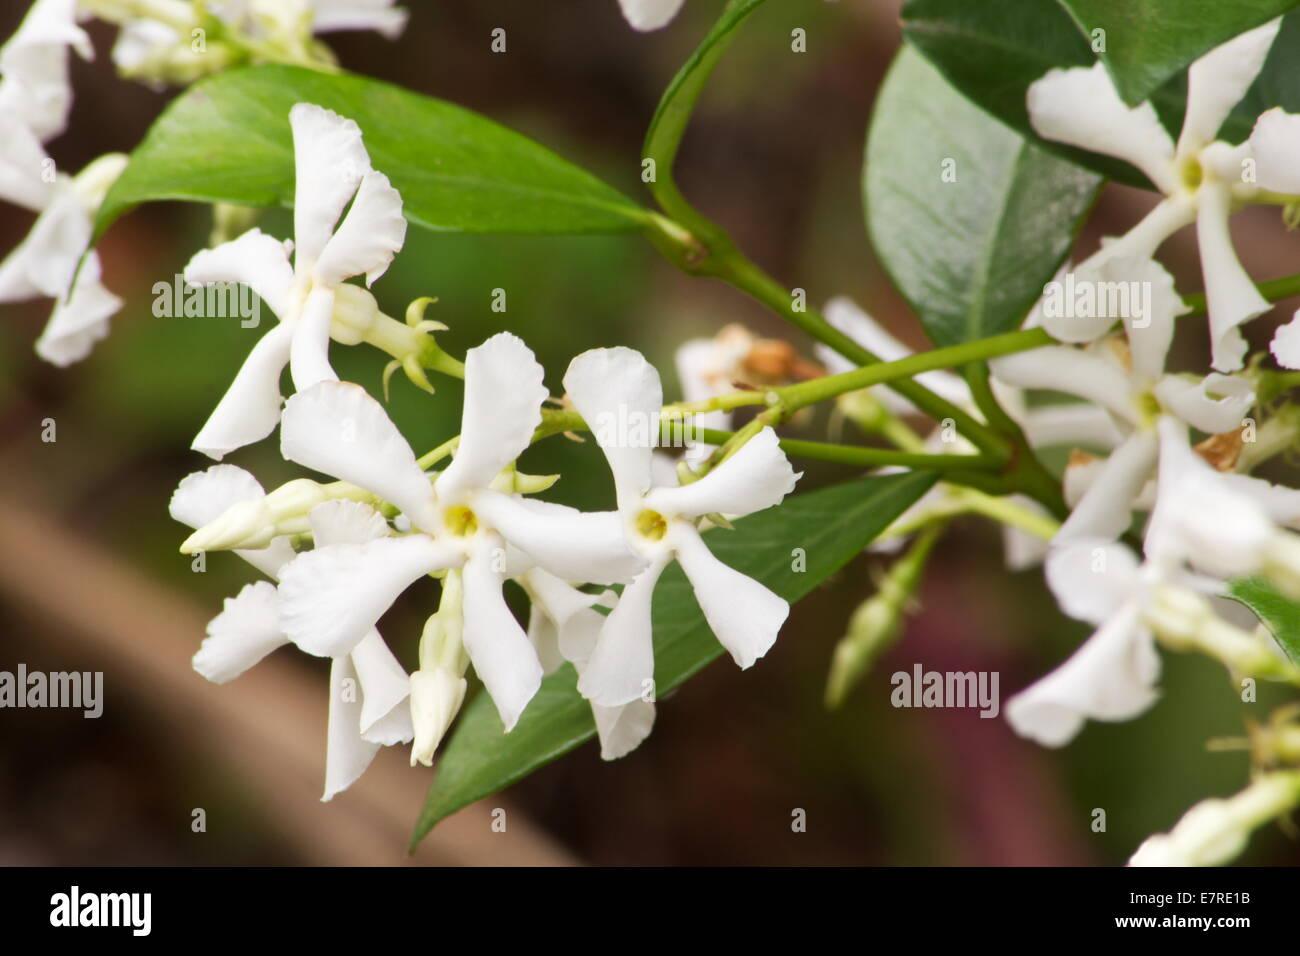 Star Jasmine Trachelospermum Jasminoides Blossoms Stock Photo